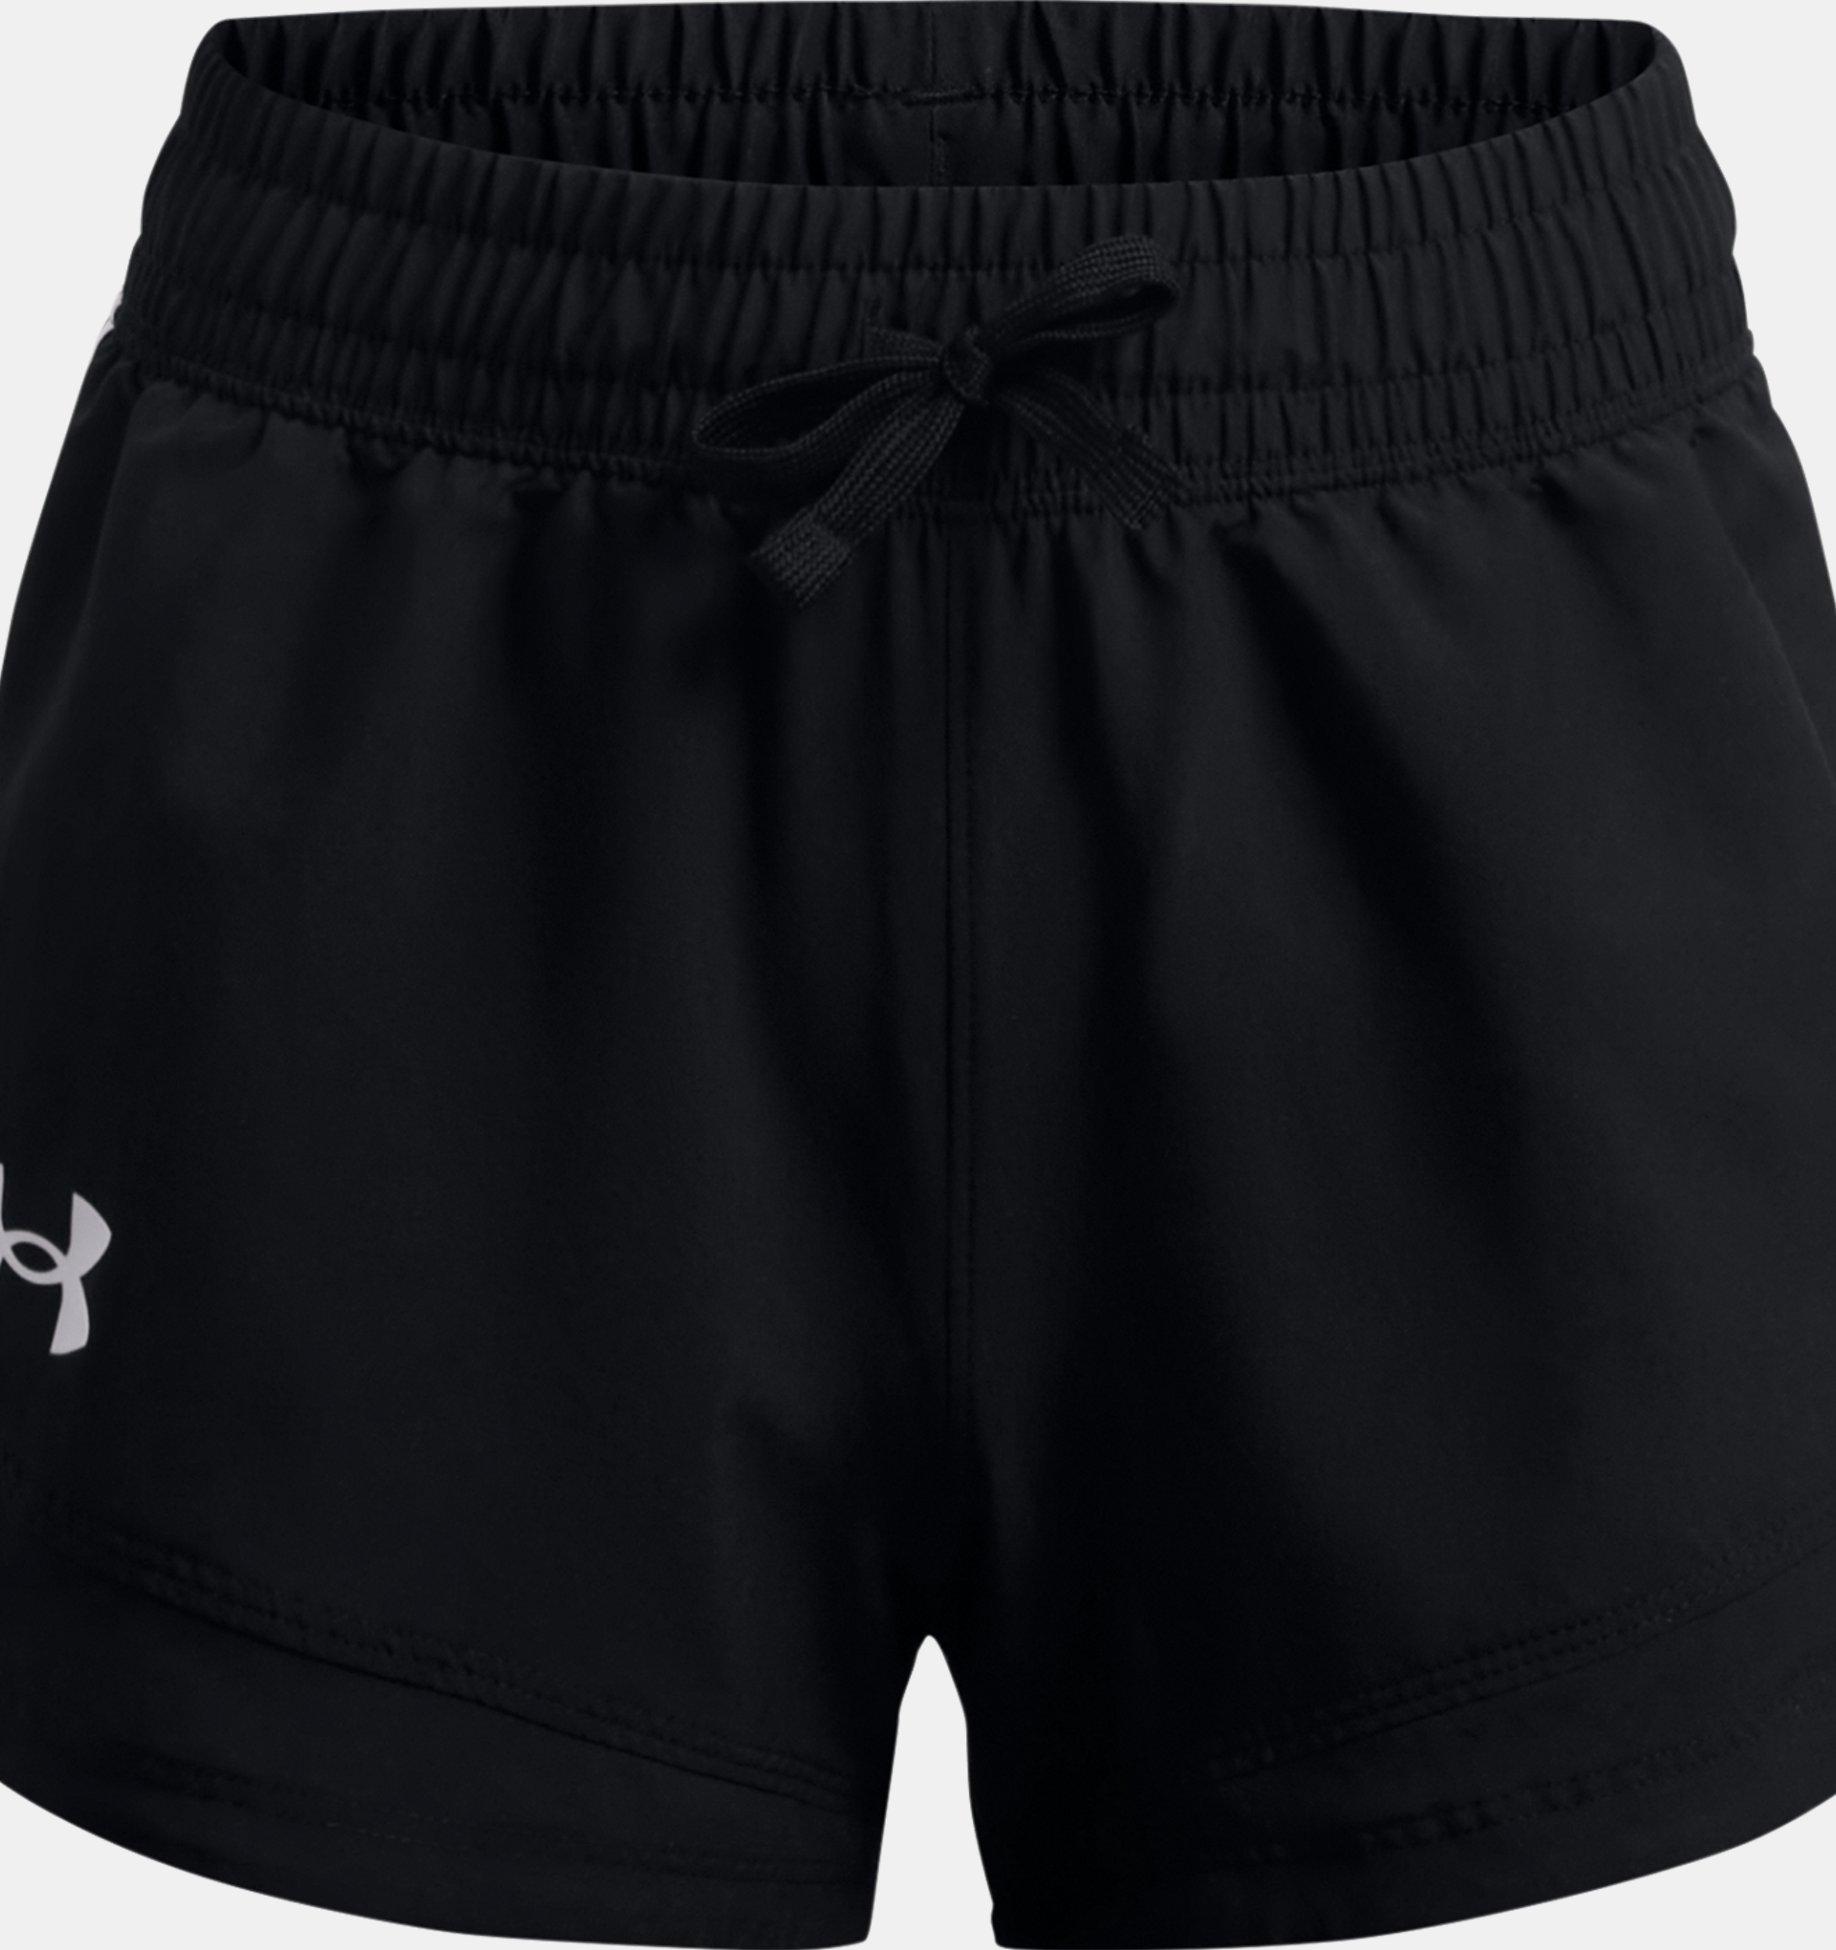 Underarmour Girls UA Sprint Shorts